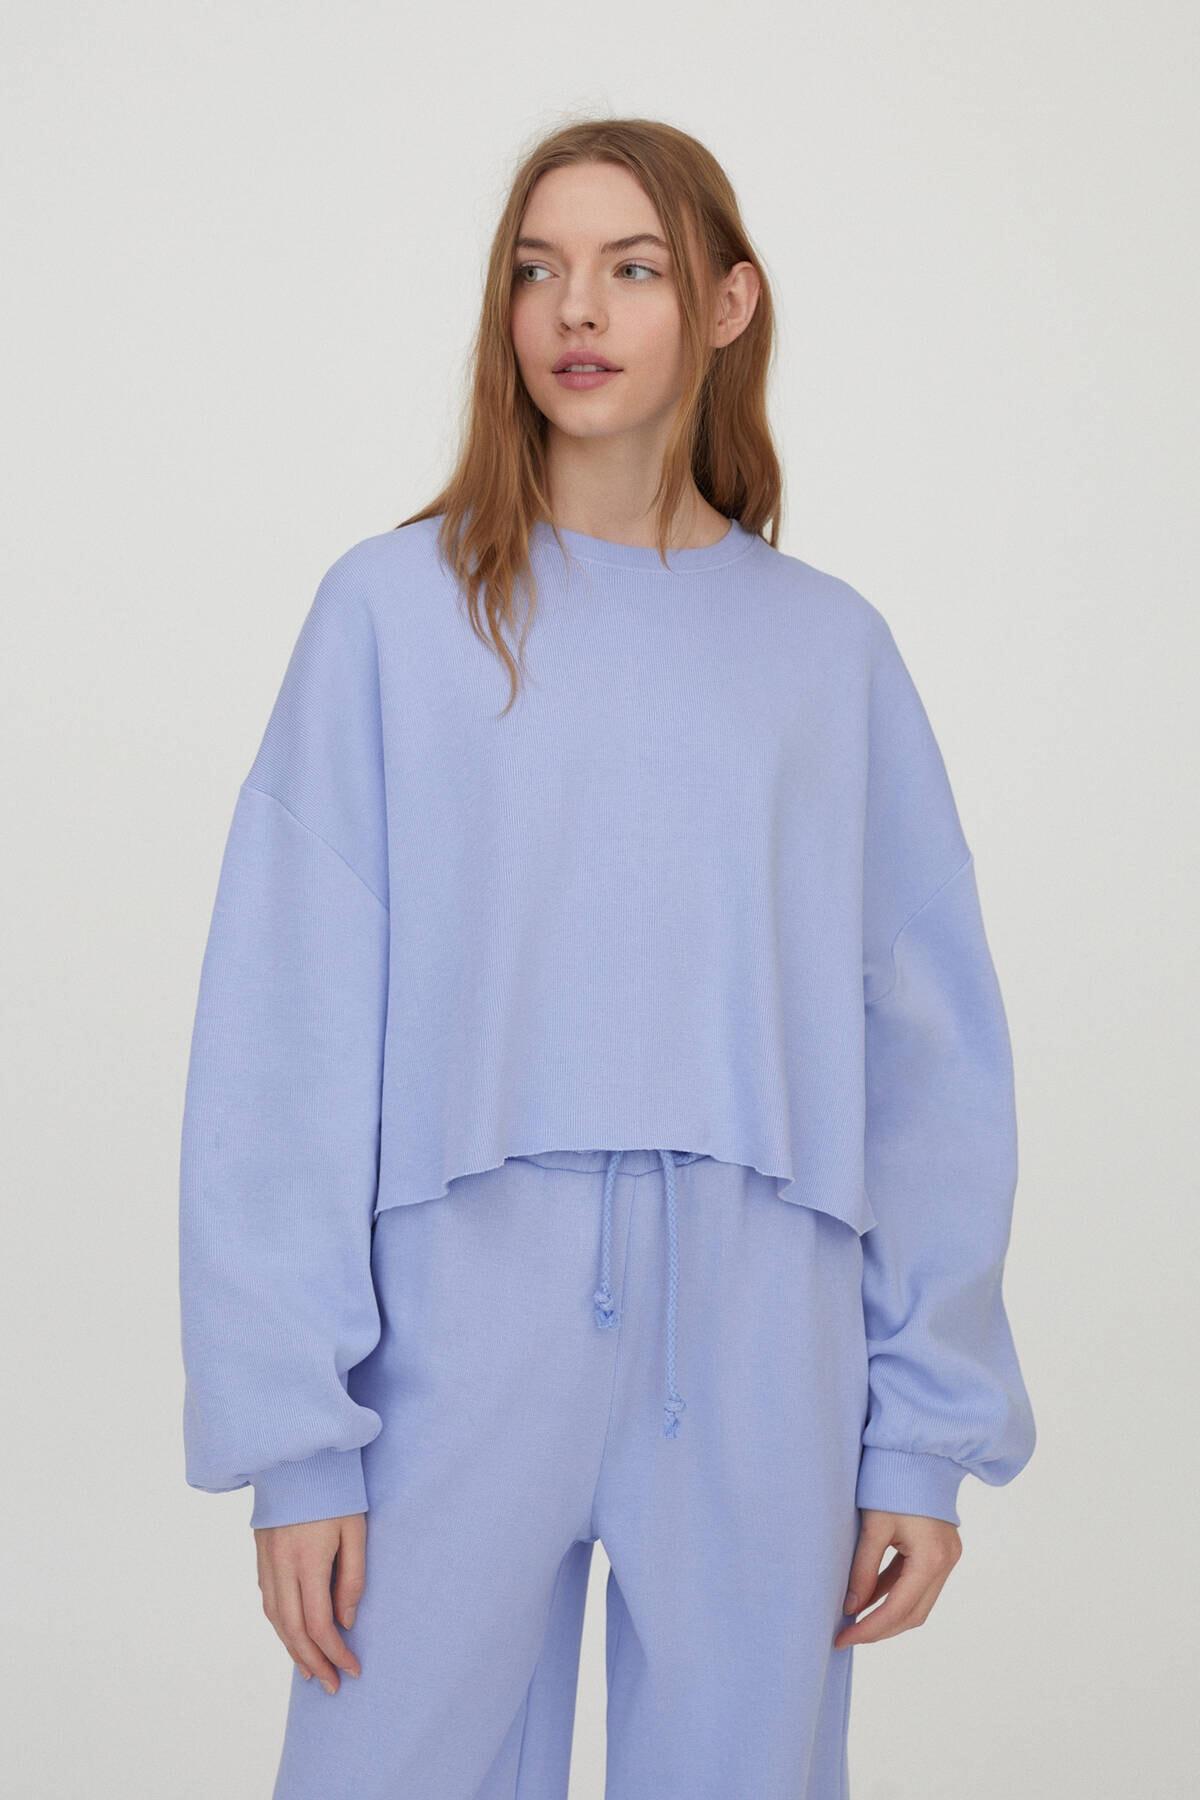 Pull & Bear Kadın Lavanta Geniş Kollu Crop Fit Sweatshirt 04591371